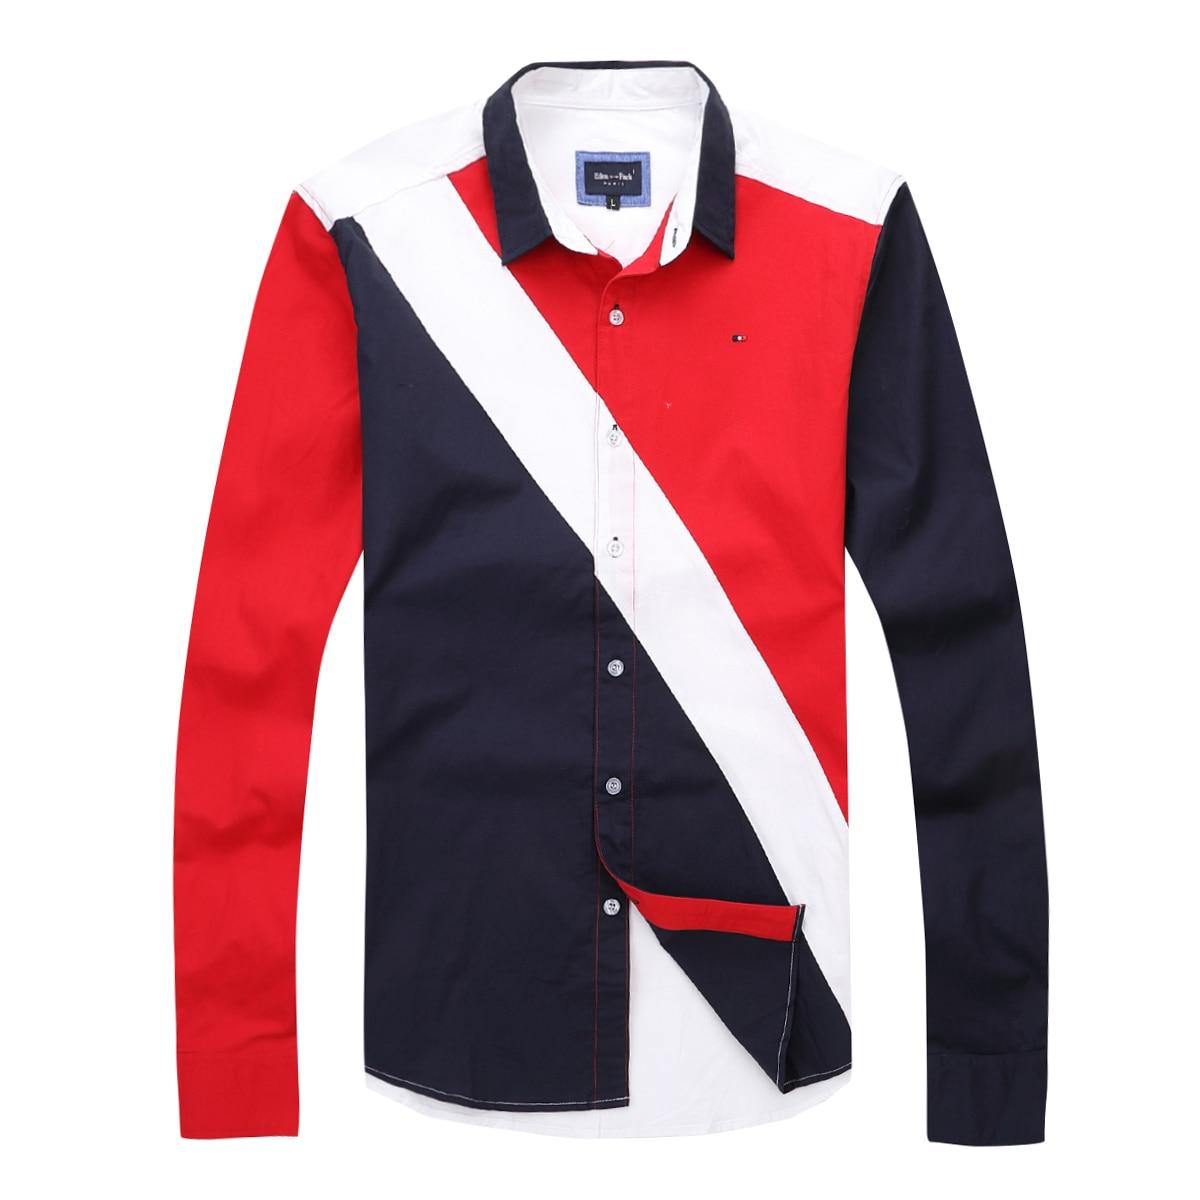 New Summer Eden-Park Men Shirt Full Sleeve Eden/Park Homme Chemise Nice Quality Cotton regular Fashion Casual big size 3XL